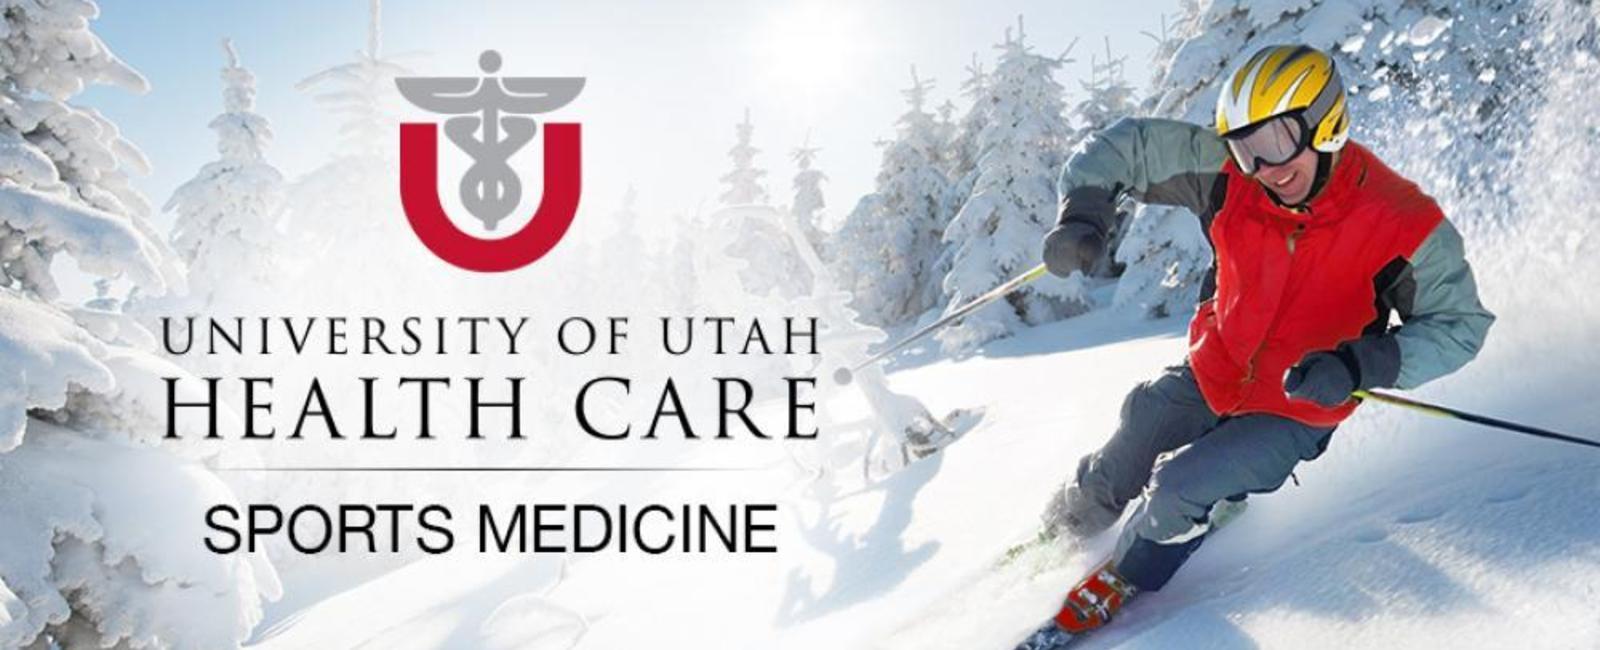 Skiing vs. Snowboarding Injury Prevention